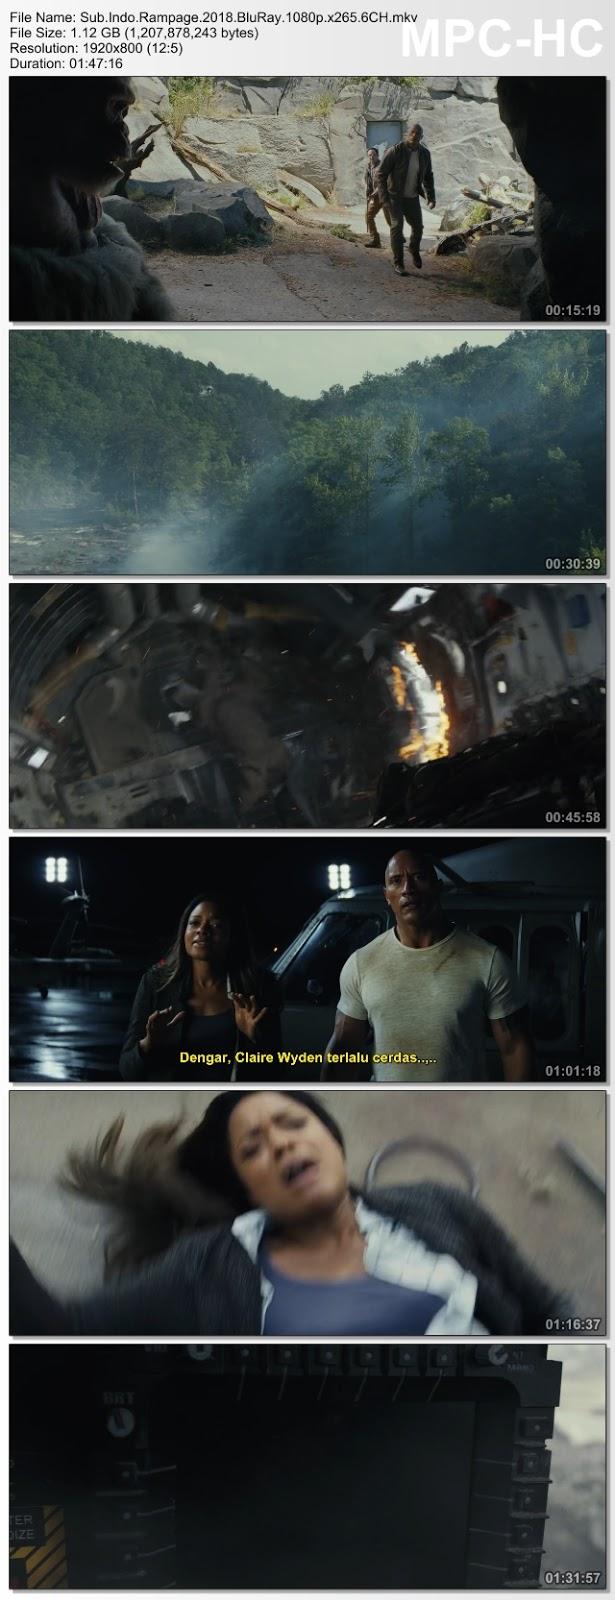 Screenshots Download Film Gratis Rampage (2018) BluRay 480p MP4 Subtitle Bahasa Indonesia 3GP